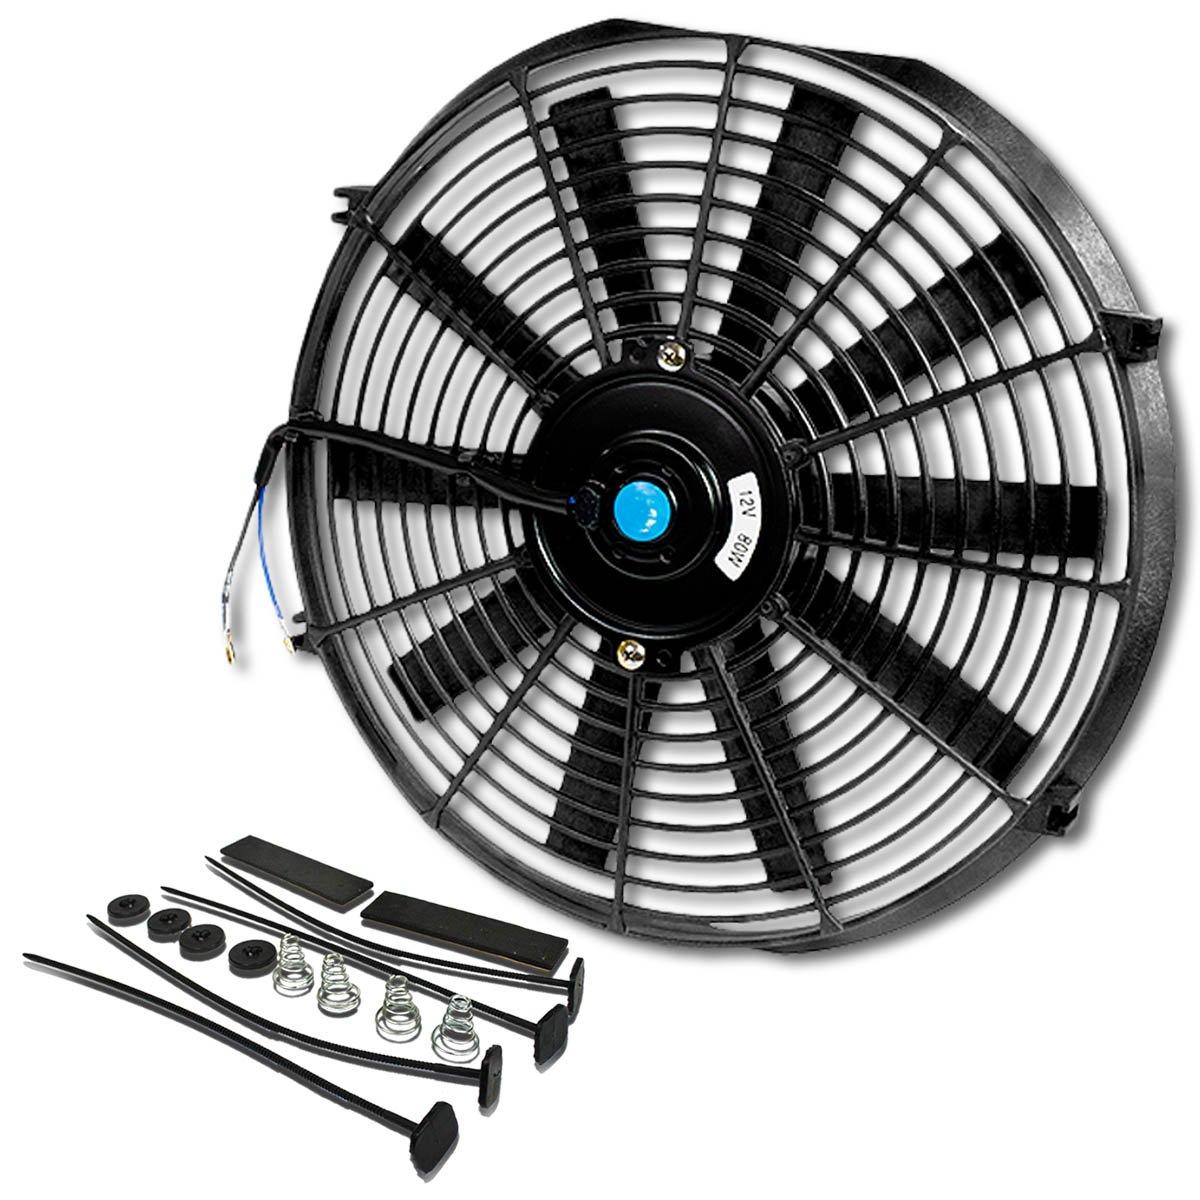 14 Inch High Performance Black Electric Radiator Cooling Fan Kit